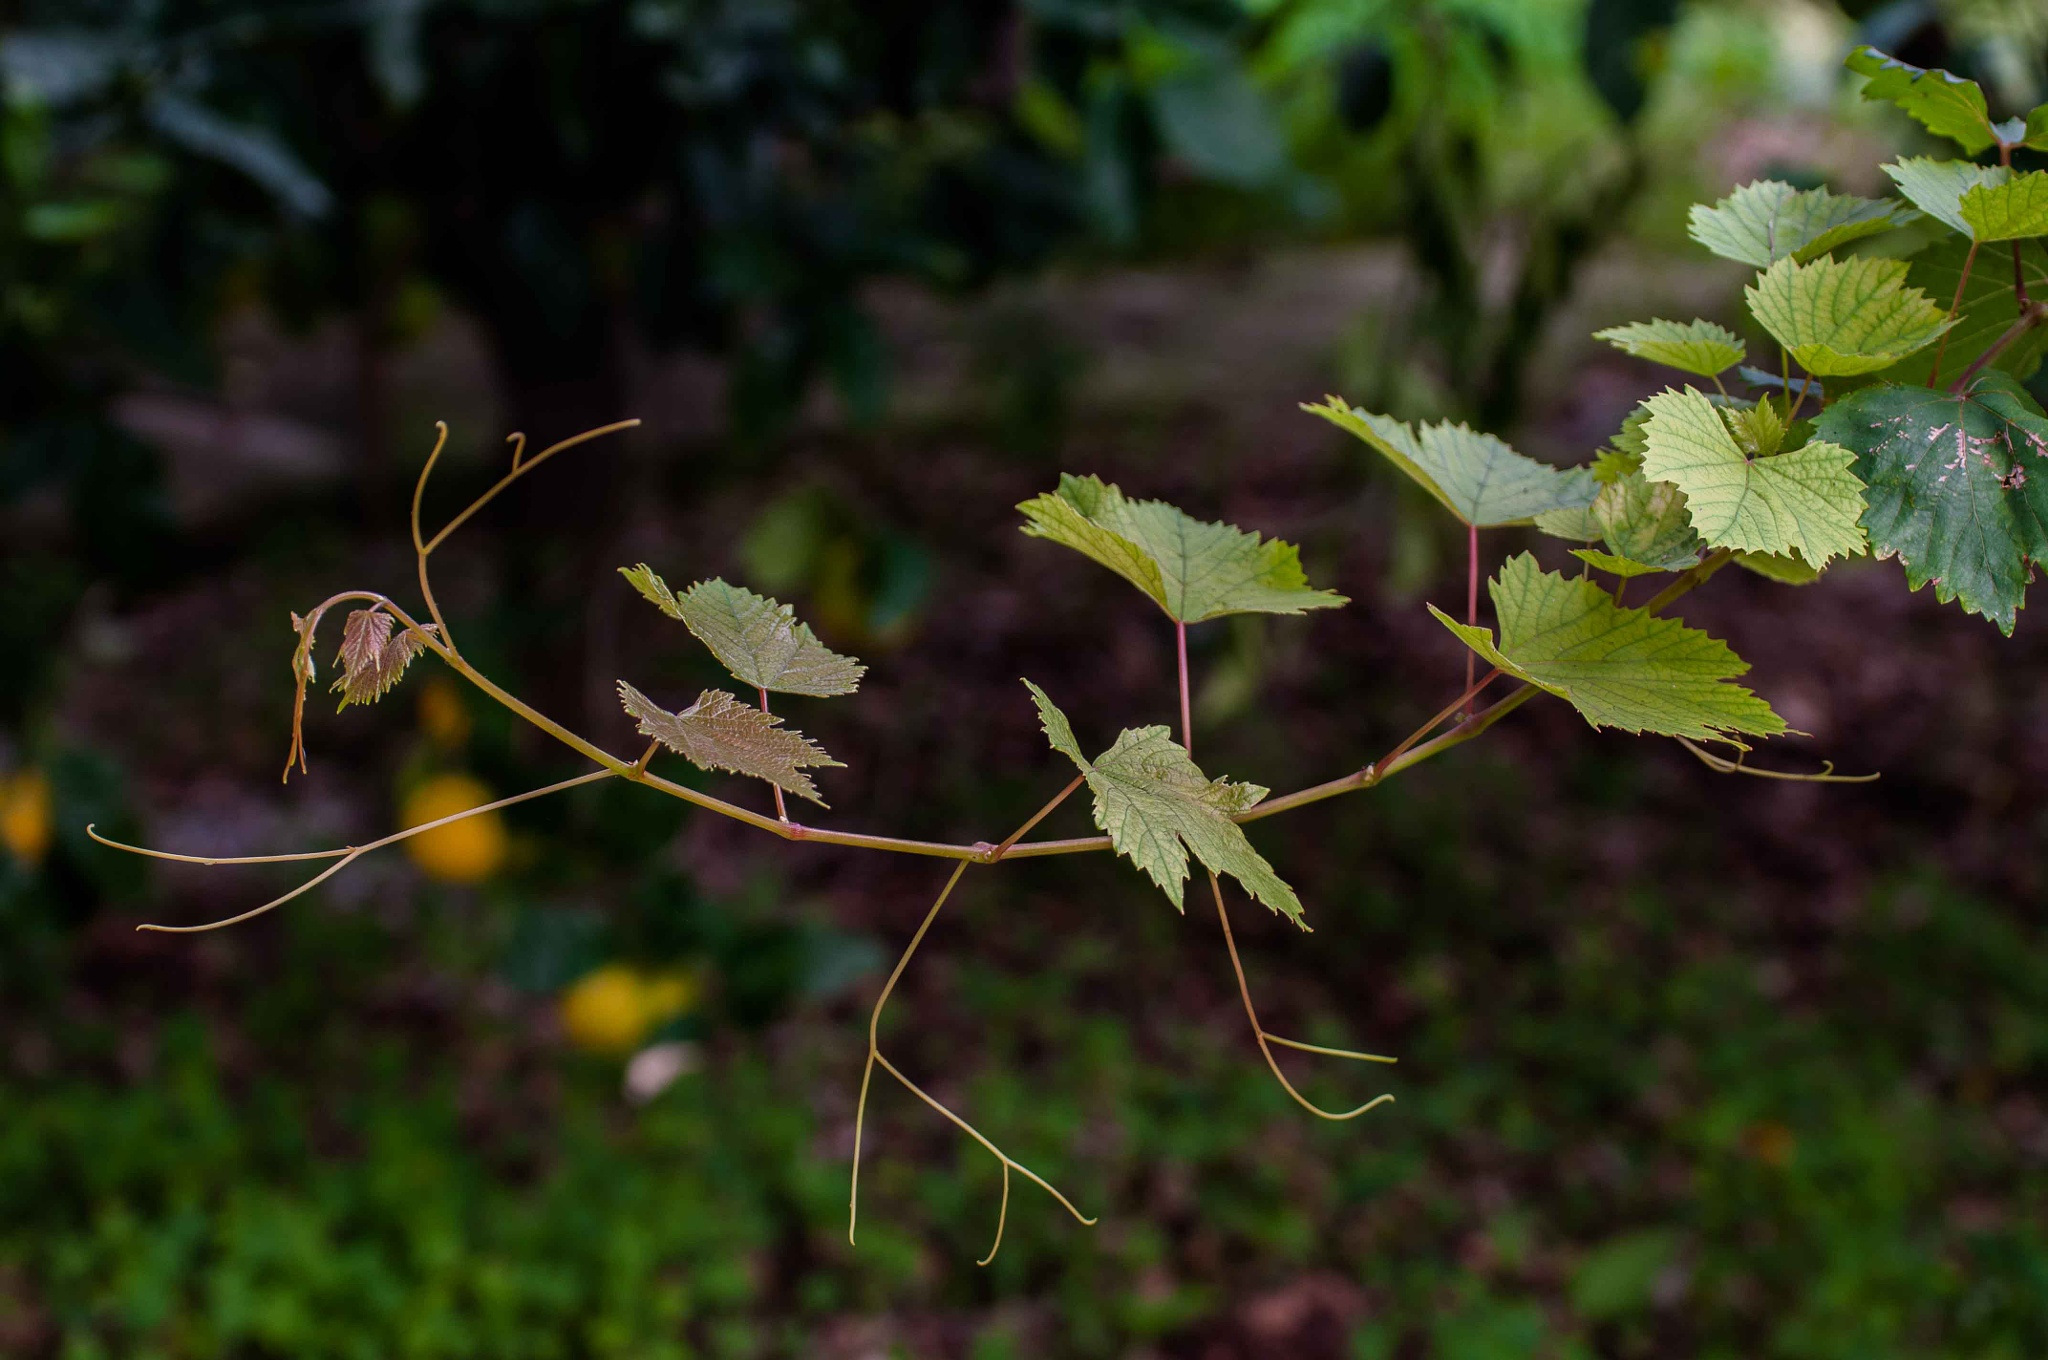 the vine branch by gaetano.pistoia.14